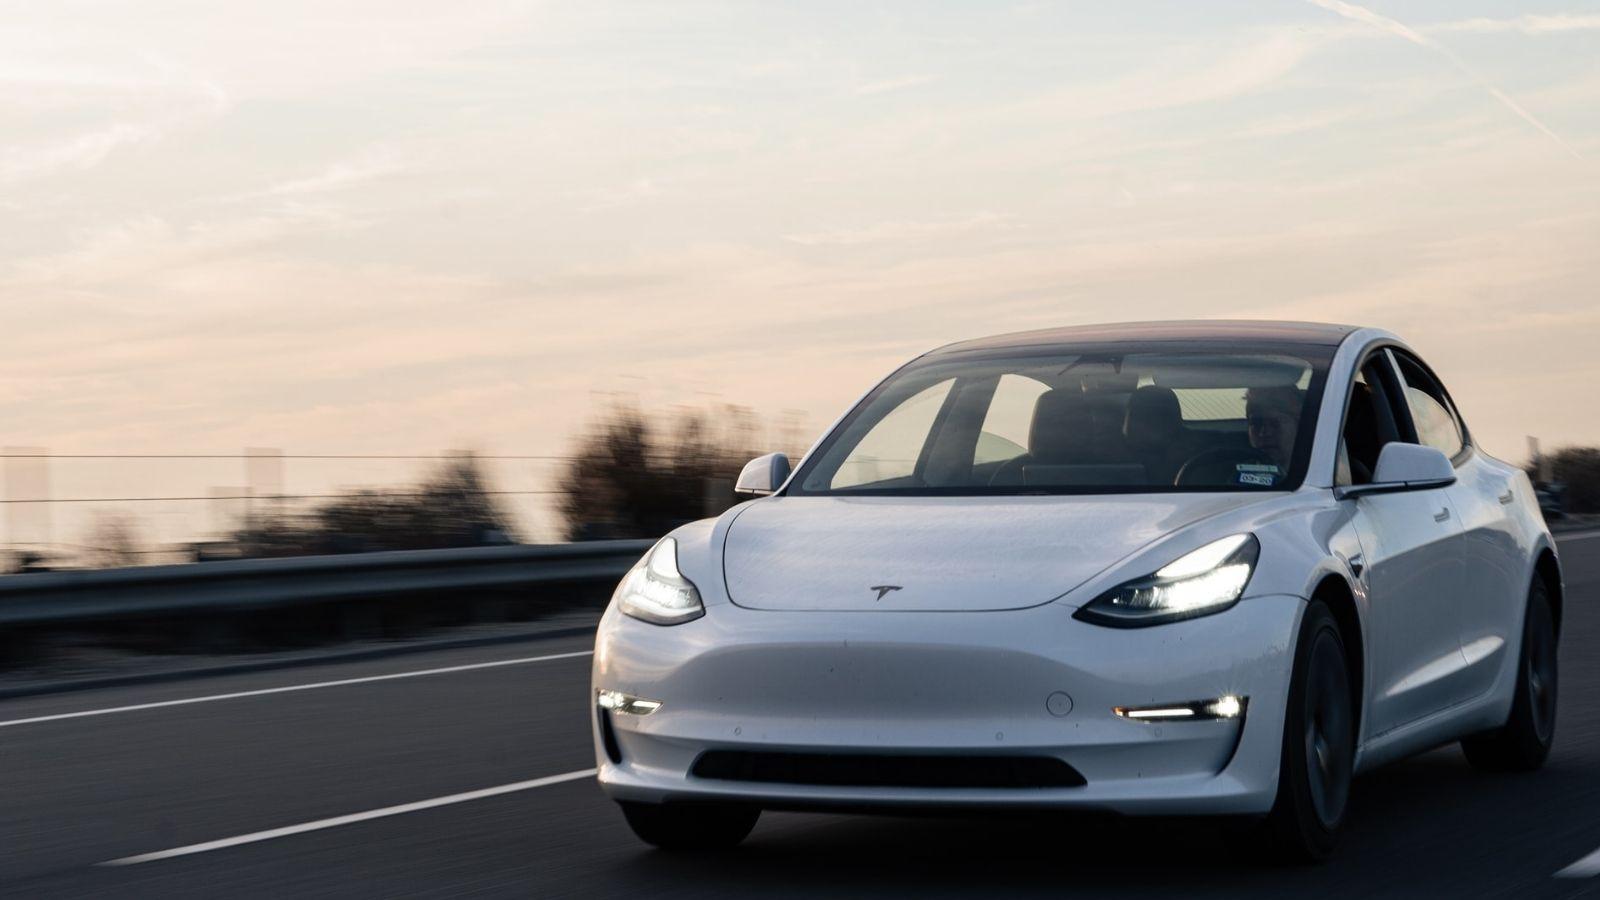 Tesla Car White Color